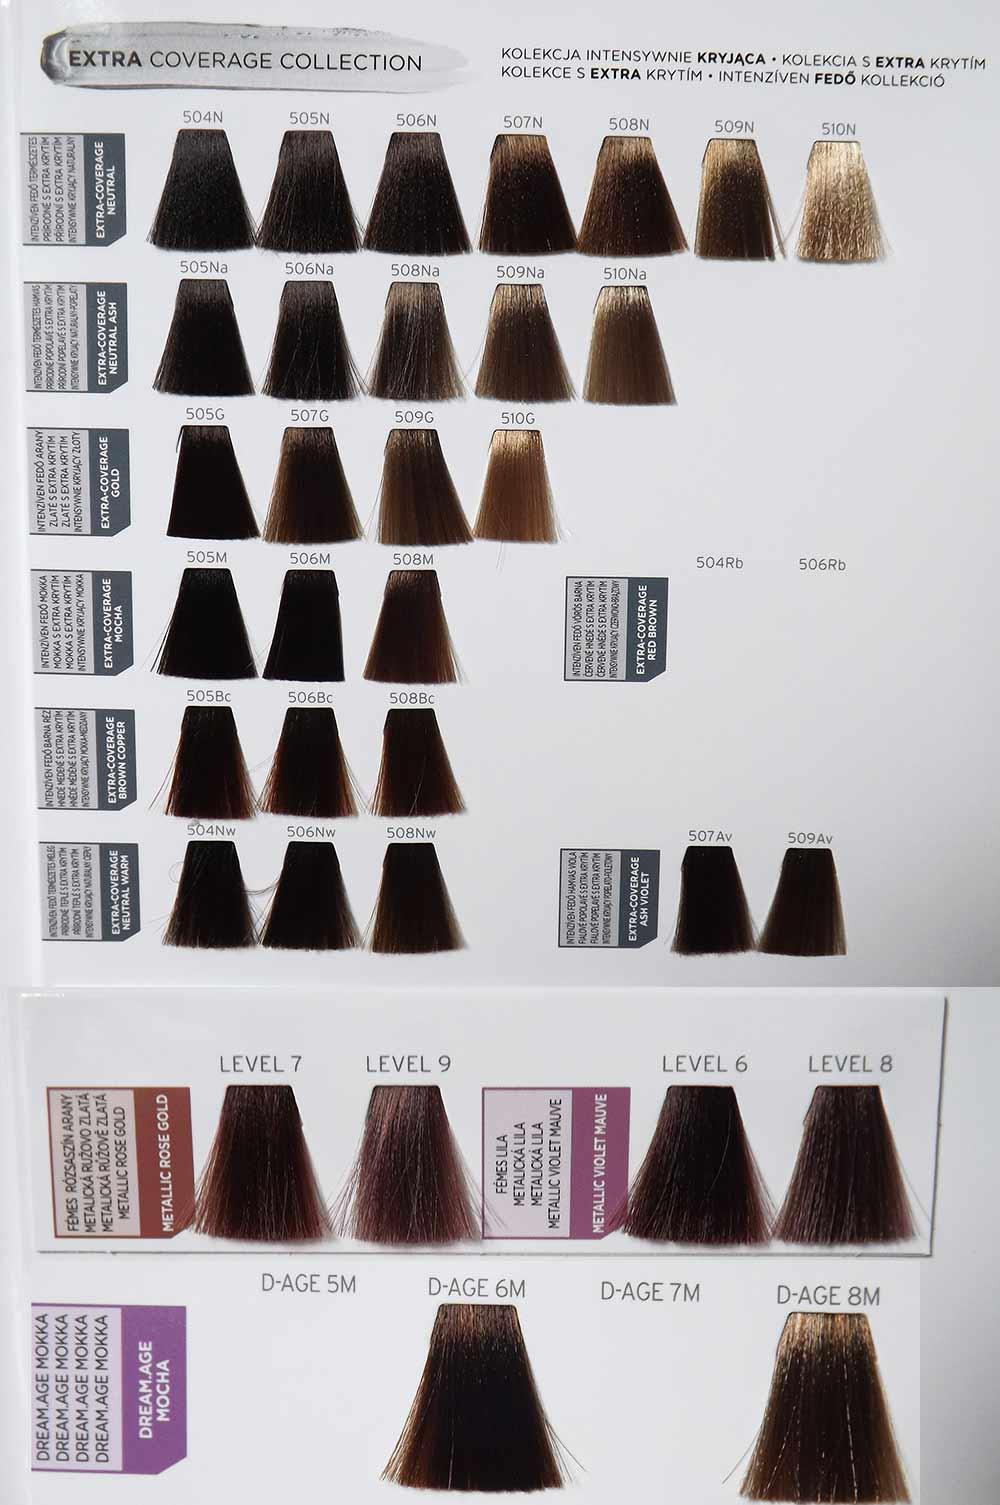 Мужские стрижки фото на короткие волосы полубокс налит